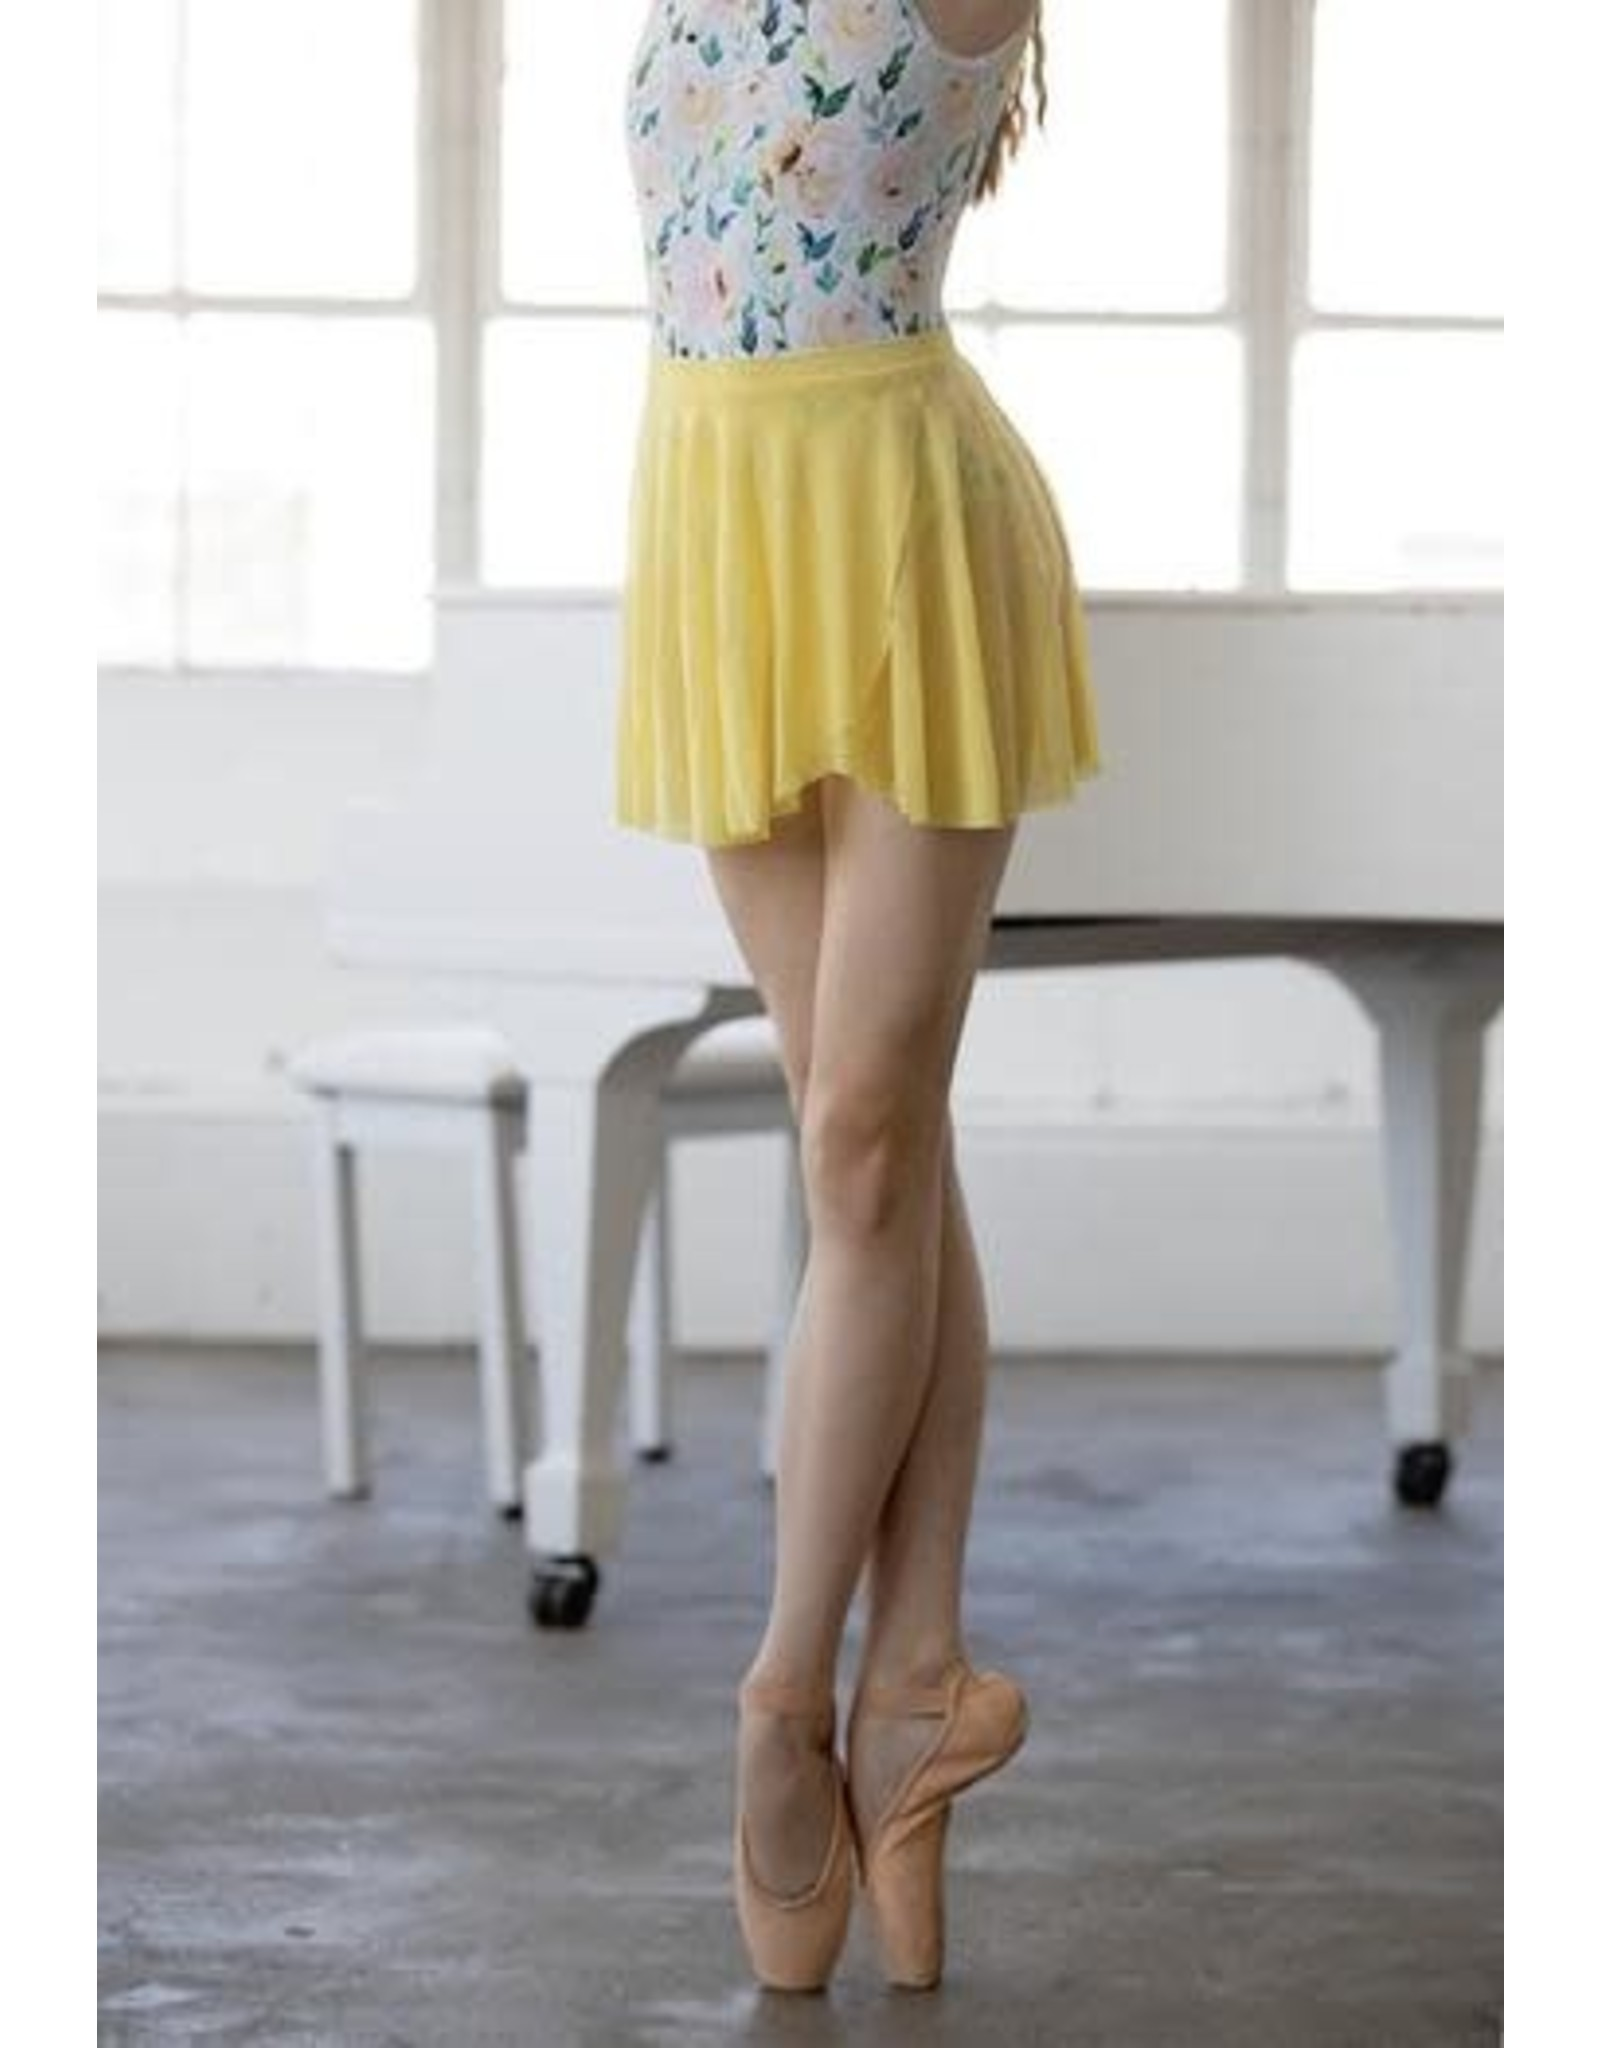 Chic Ballet The Evaline Skirt buttercup